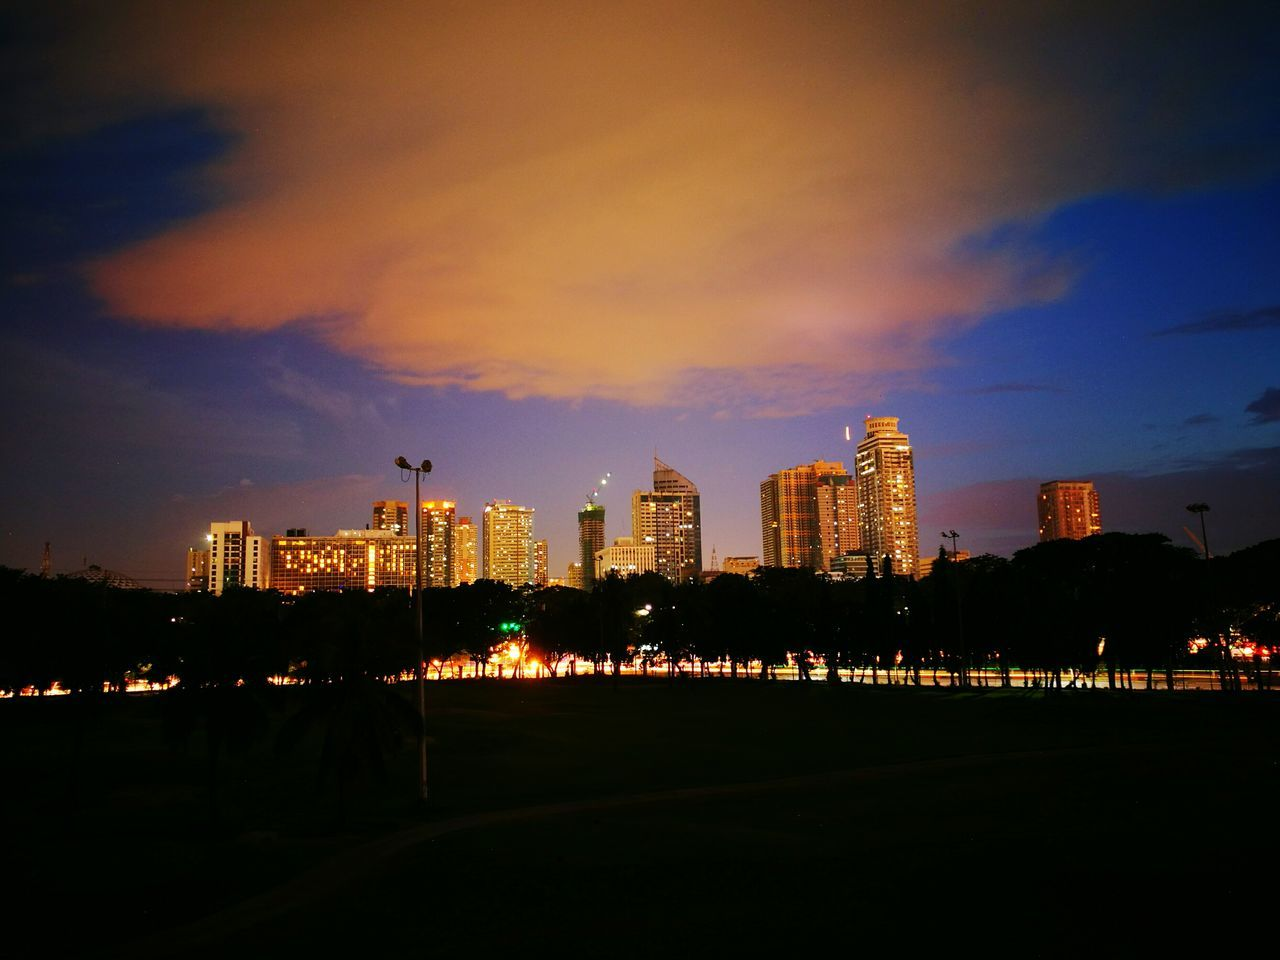 architecture, building exterior, city, skyscraper, built structure, illuminated, sky, cityscape, modern, travel destinations, no people, road, cloud - sky, urban skyline, night, outdoors